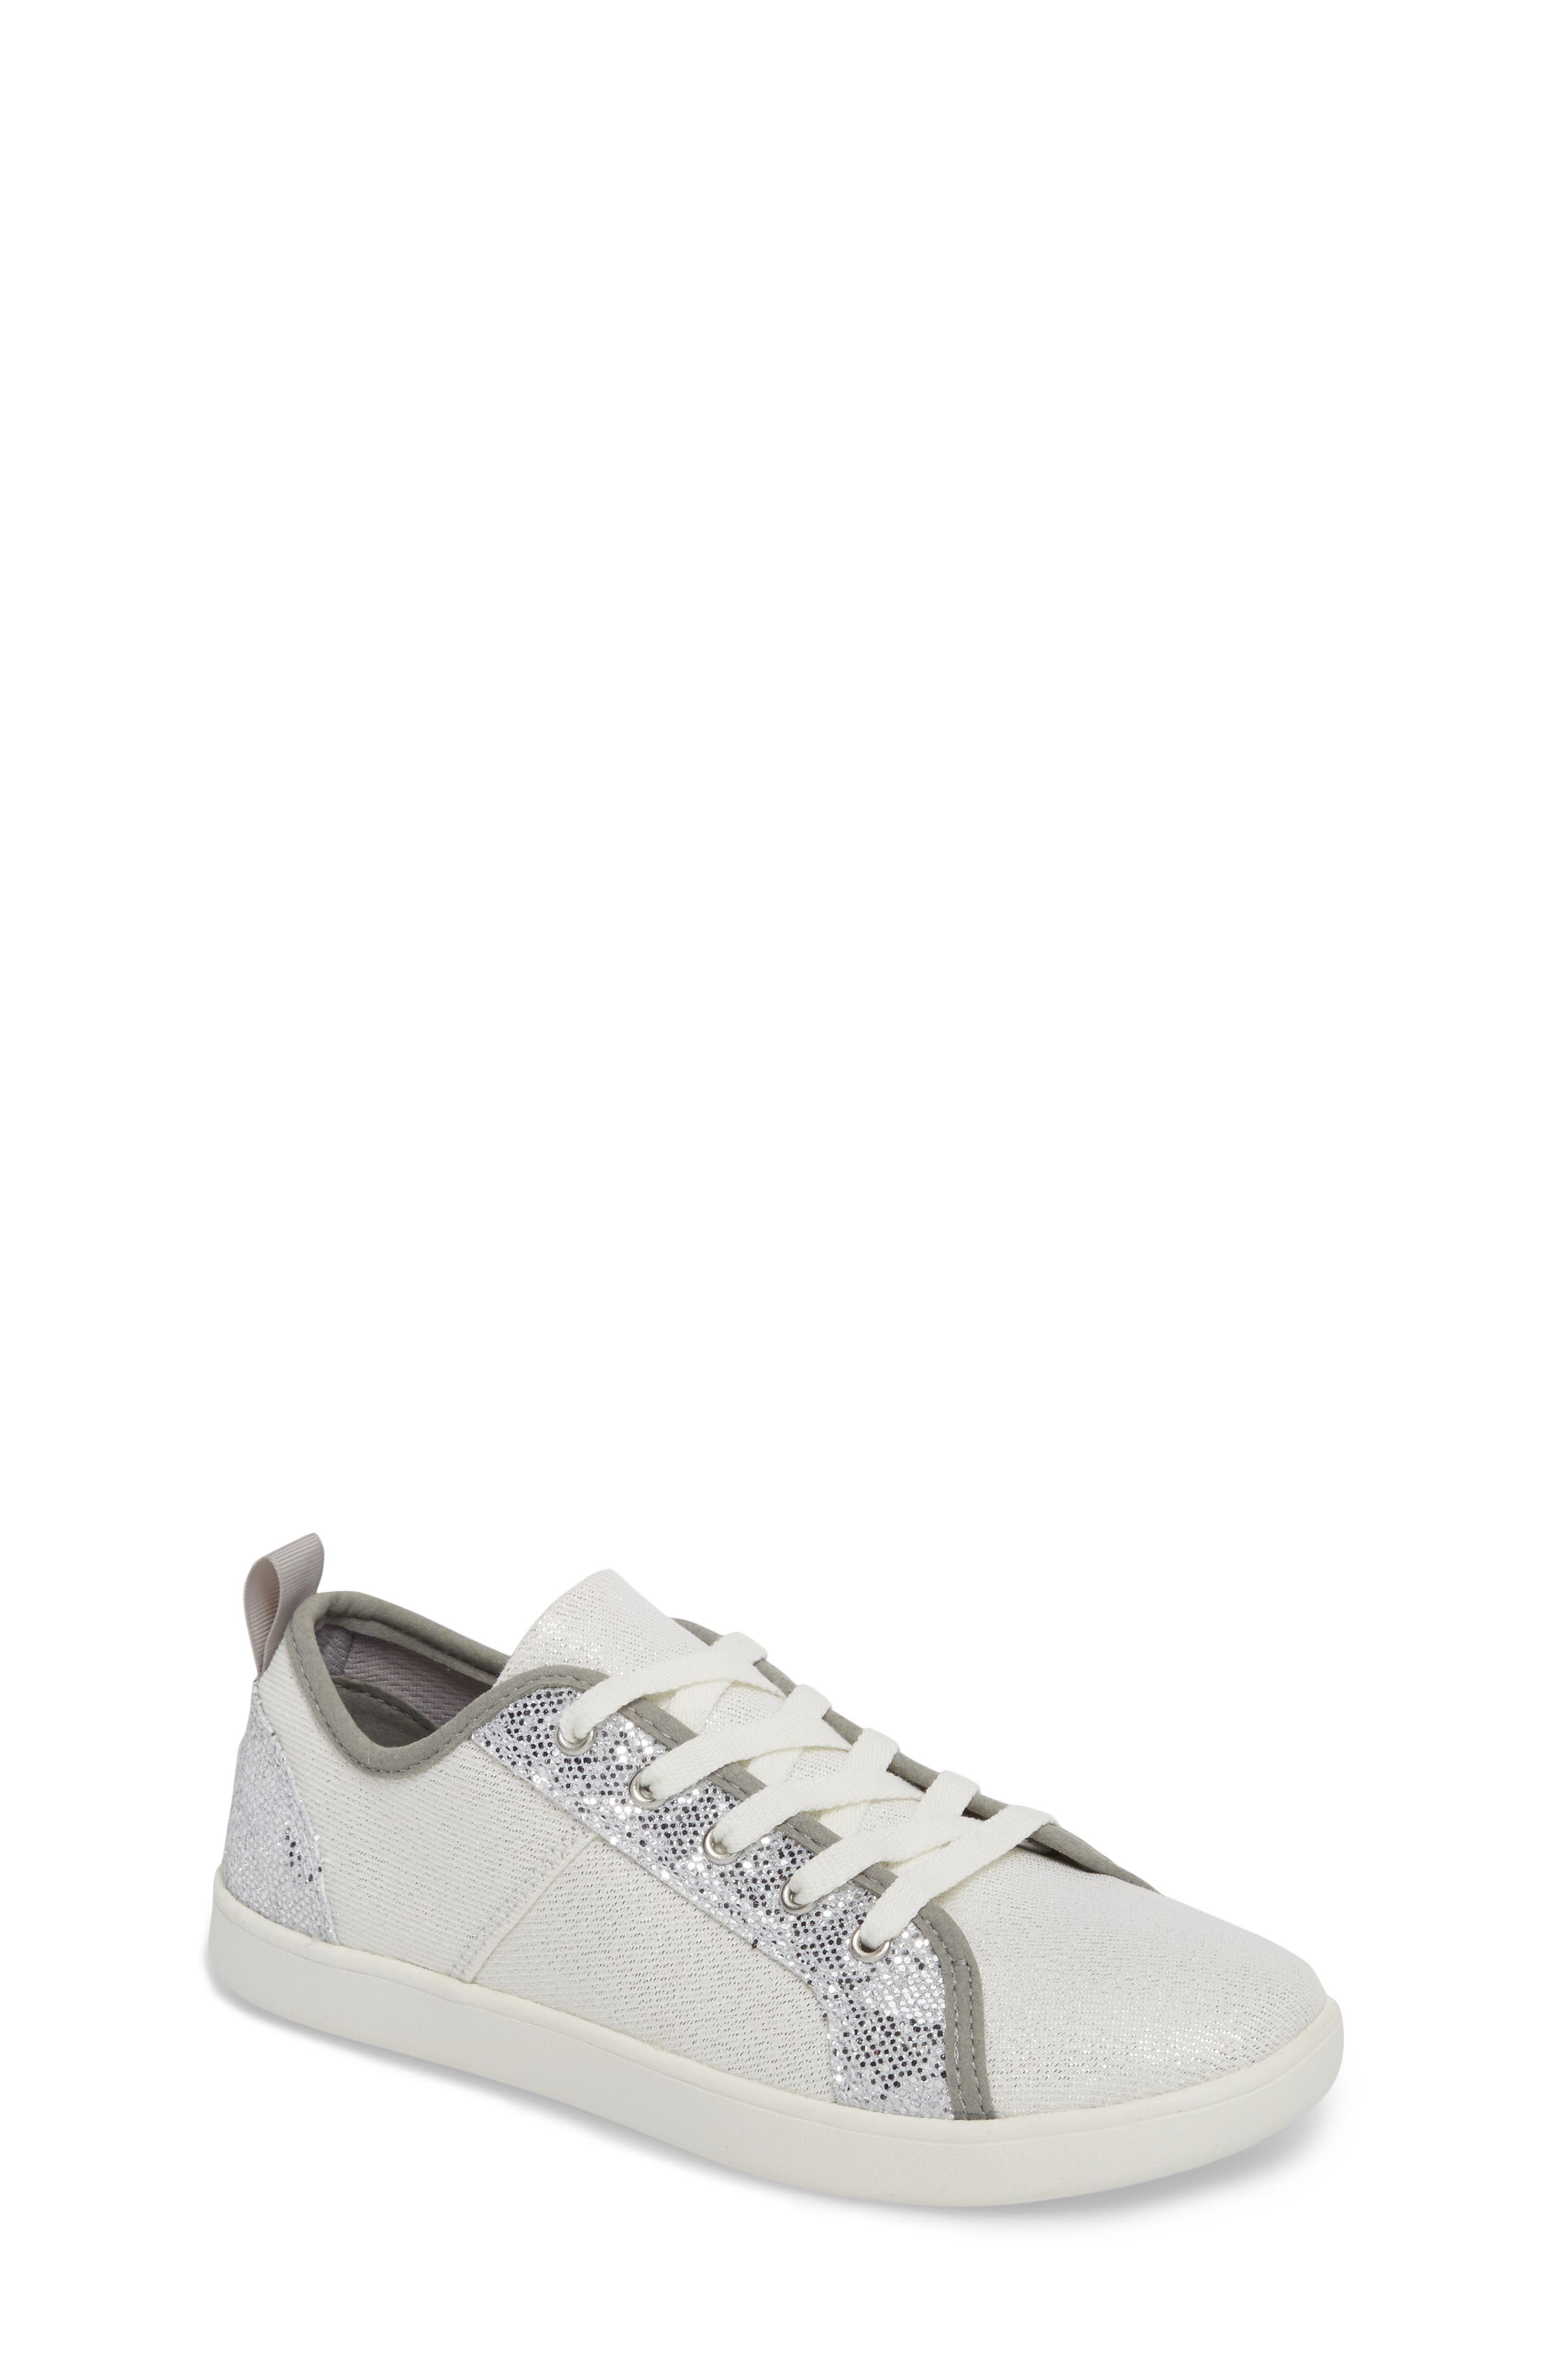 Irvin Sparkles Metallic Sneaker,                             Main thumbnail 1, color,                             Silver